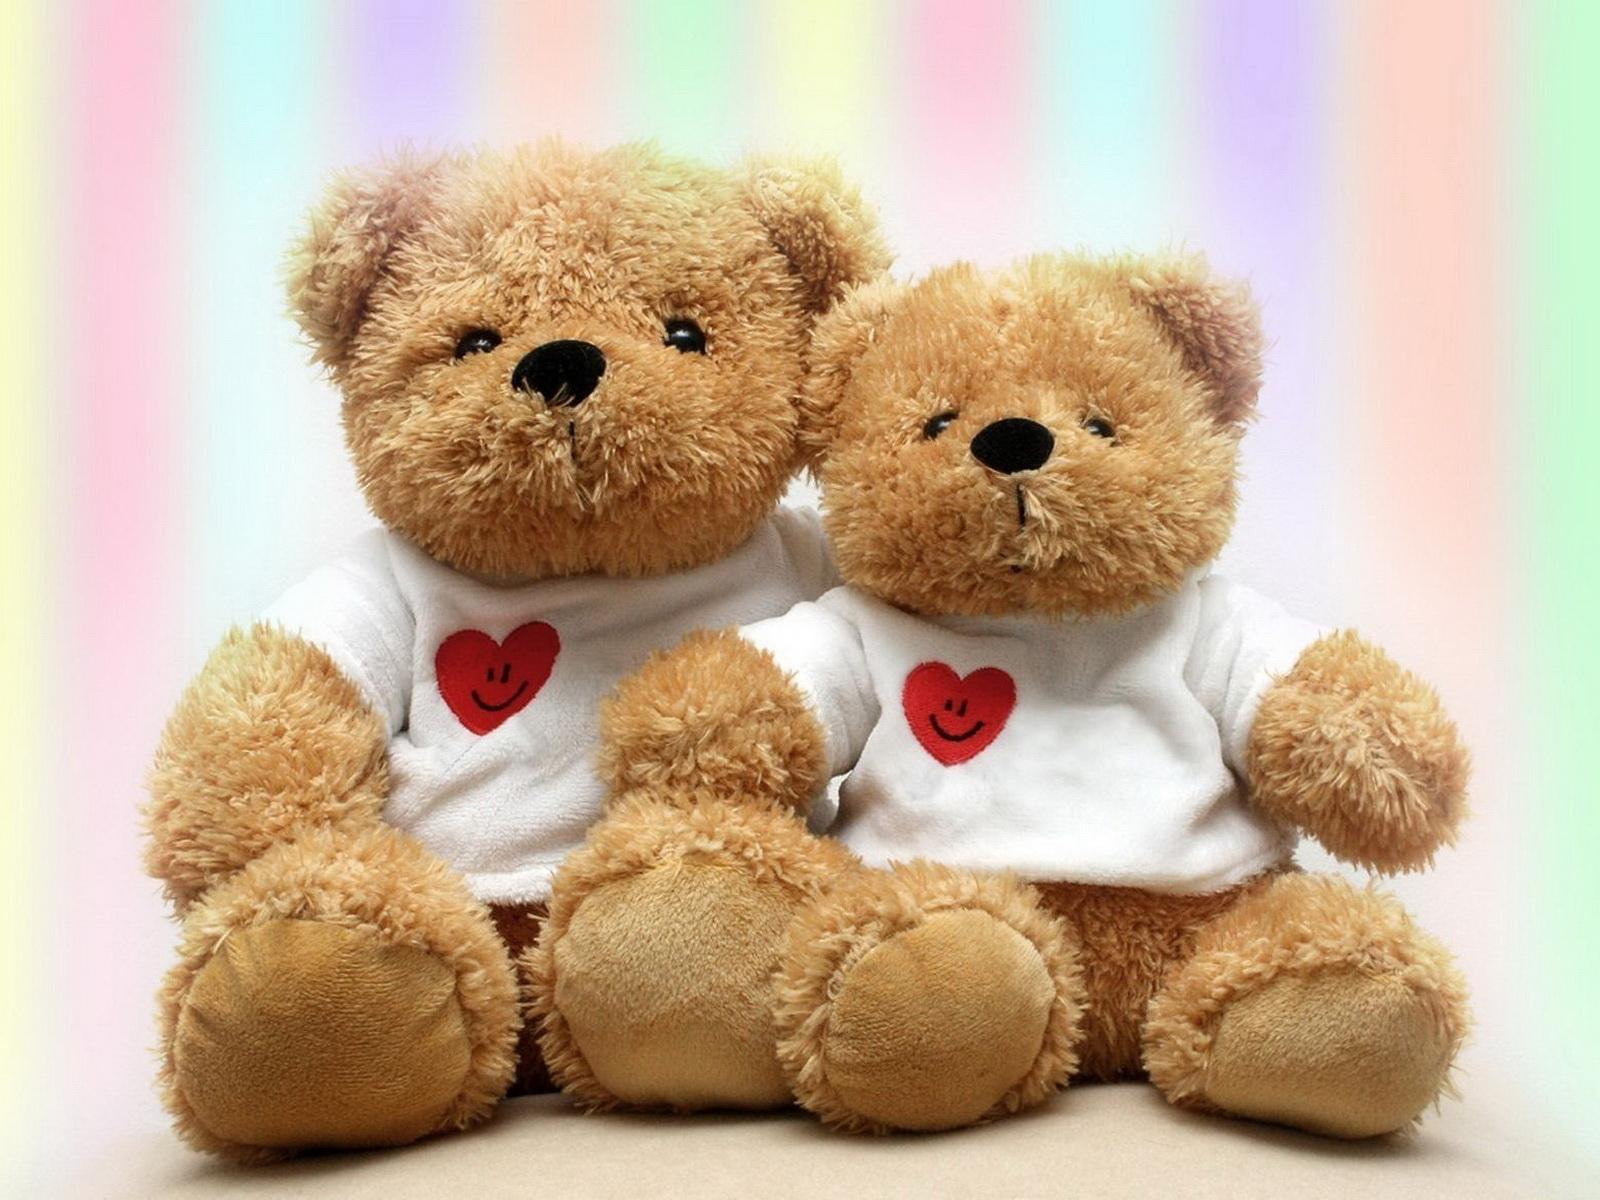 Spirits Wallpaper. Feb 25, 2013. Mood. plush toys. teddy bears. 0